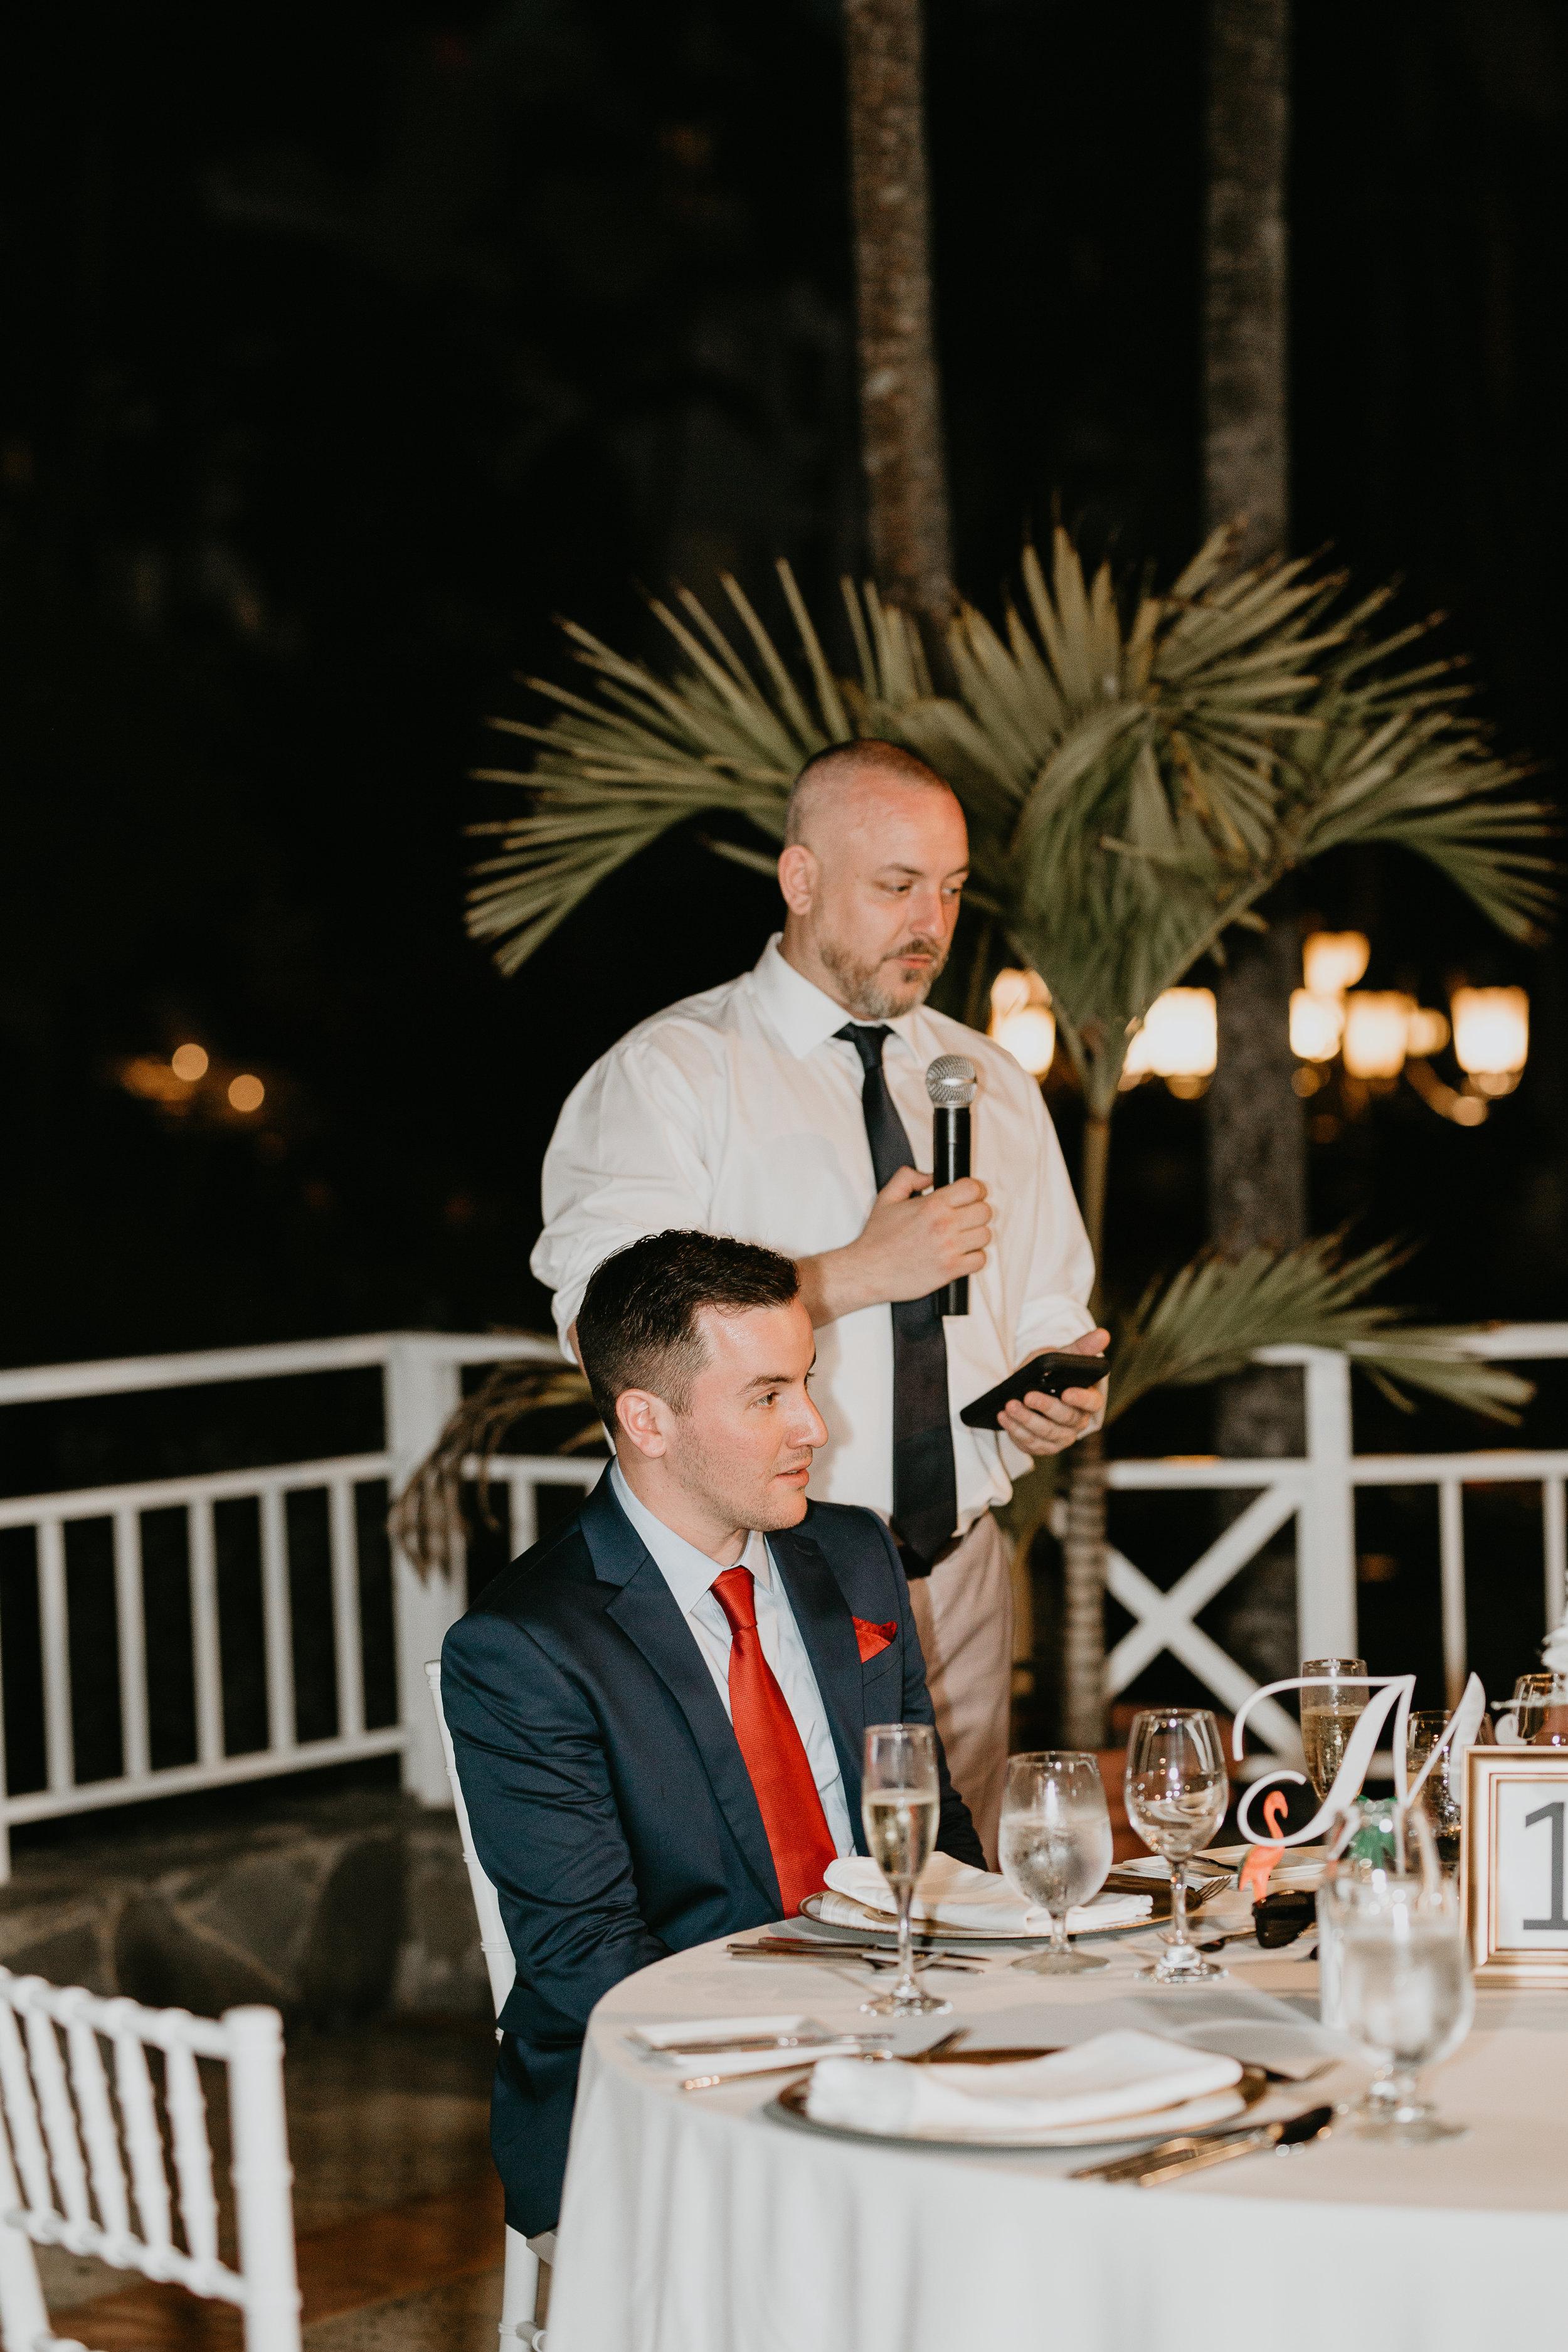 nicole-daacke-photography-destination-wedding-in-st-lucia-sandals-la-toc-intimate-island-wedding-carribean-elopement-photographer-chill-island-wedding-146.jpg